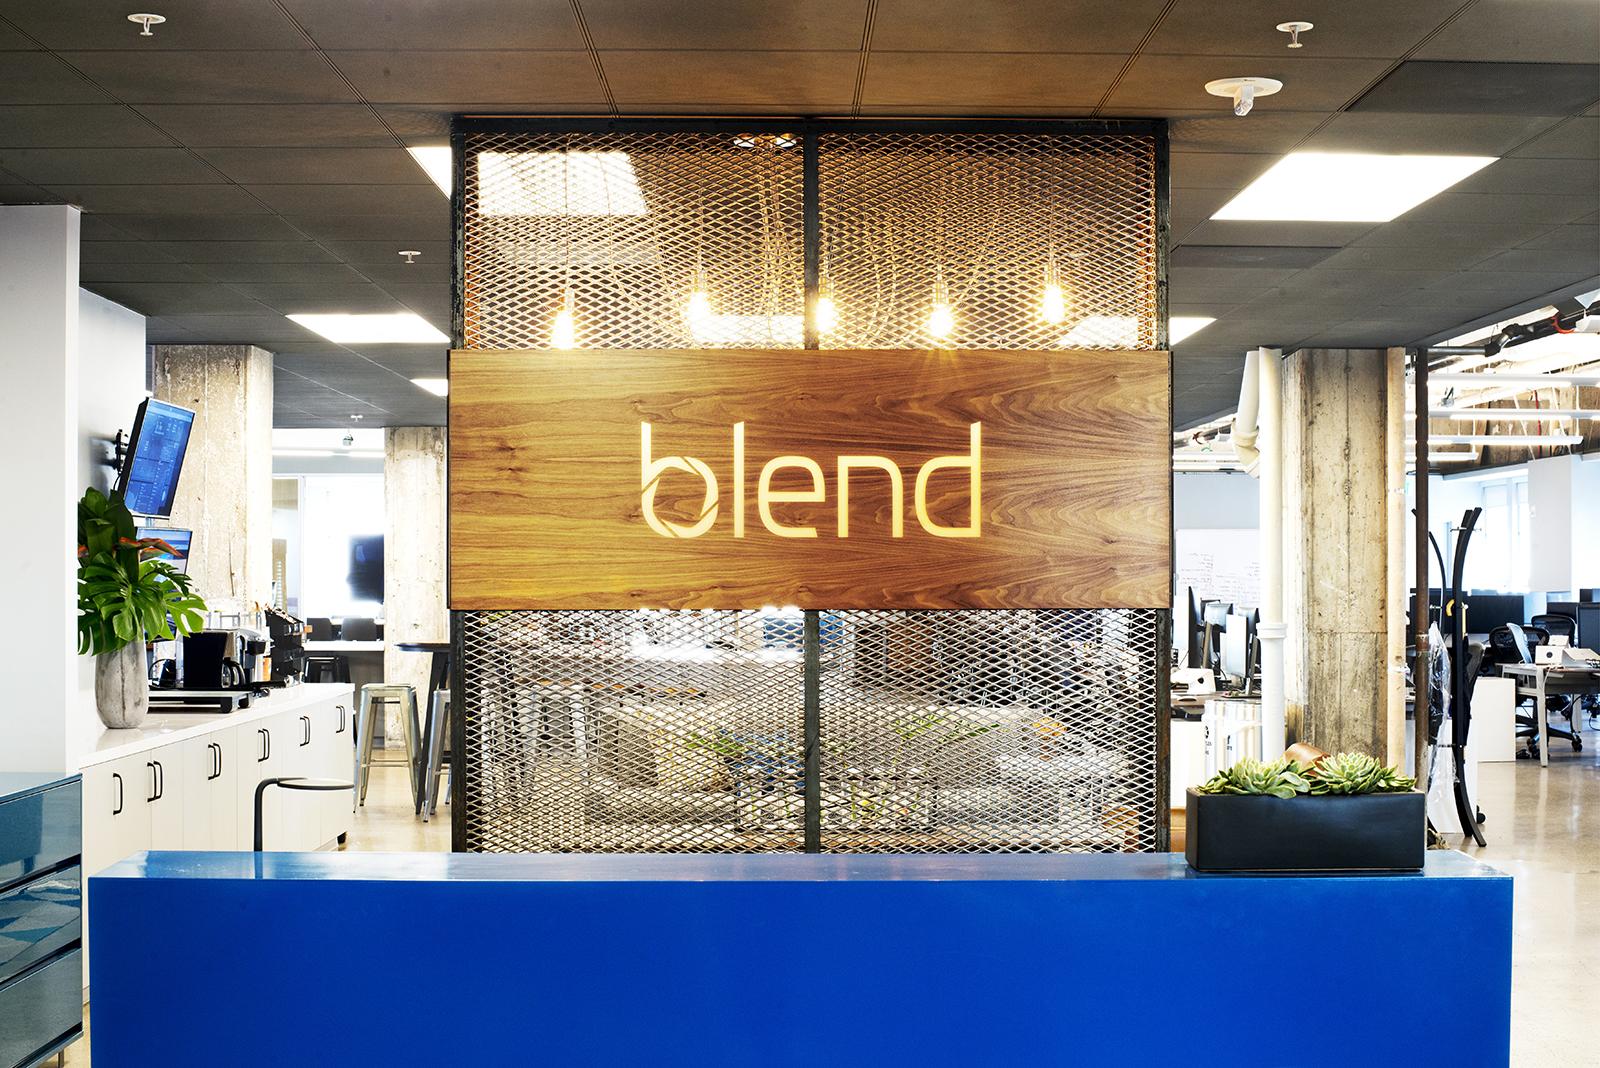 blend-san-francisco-office-1